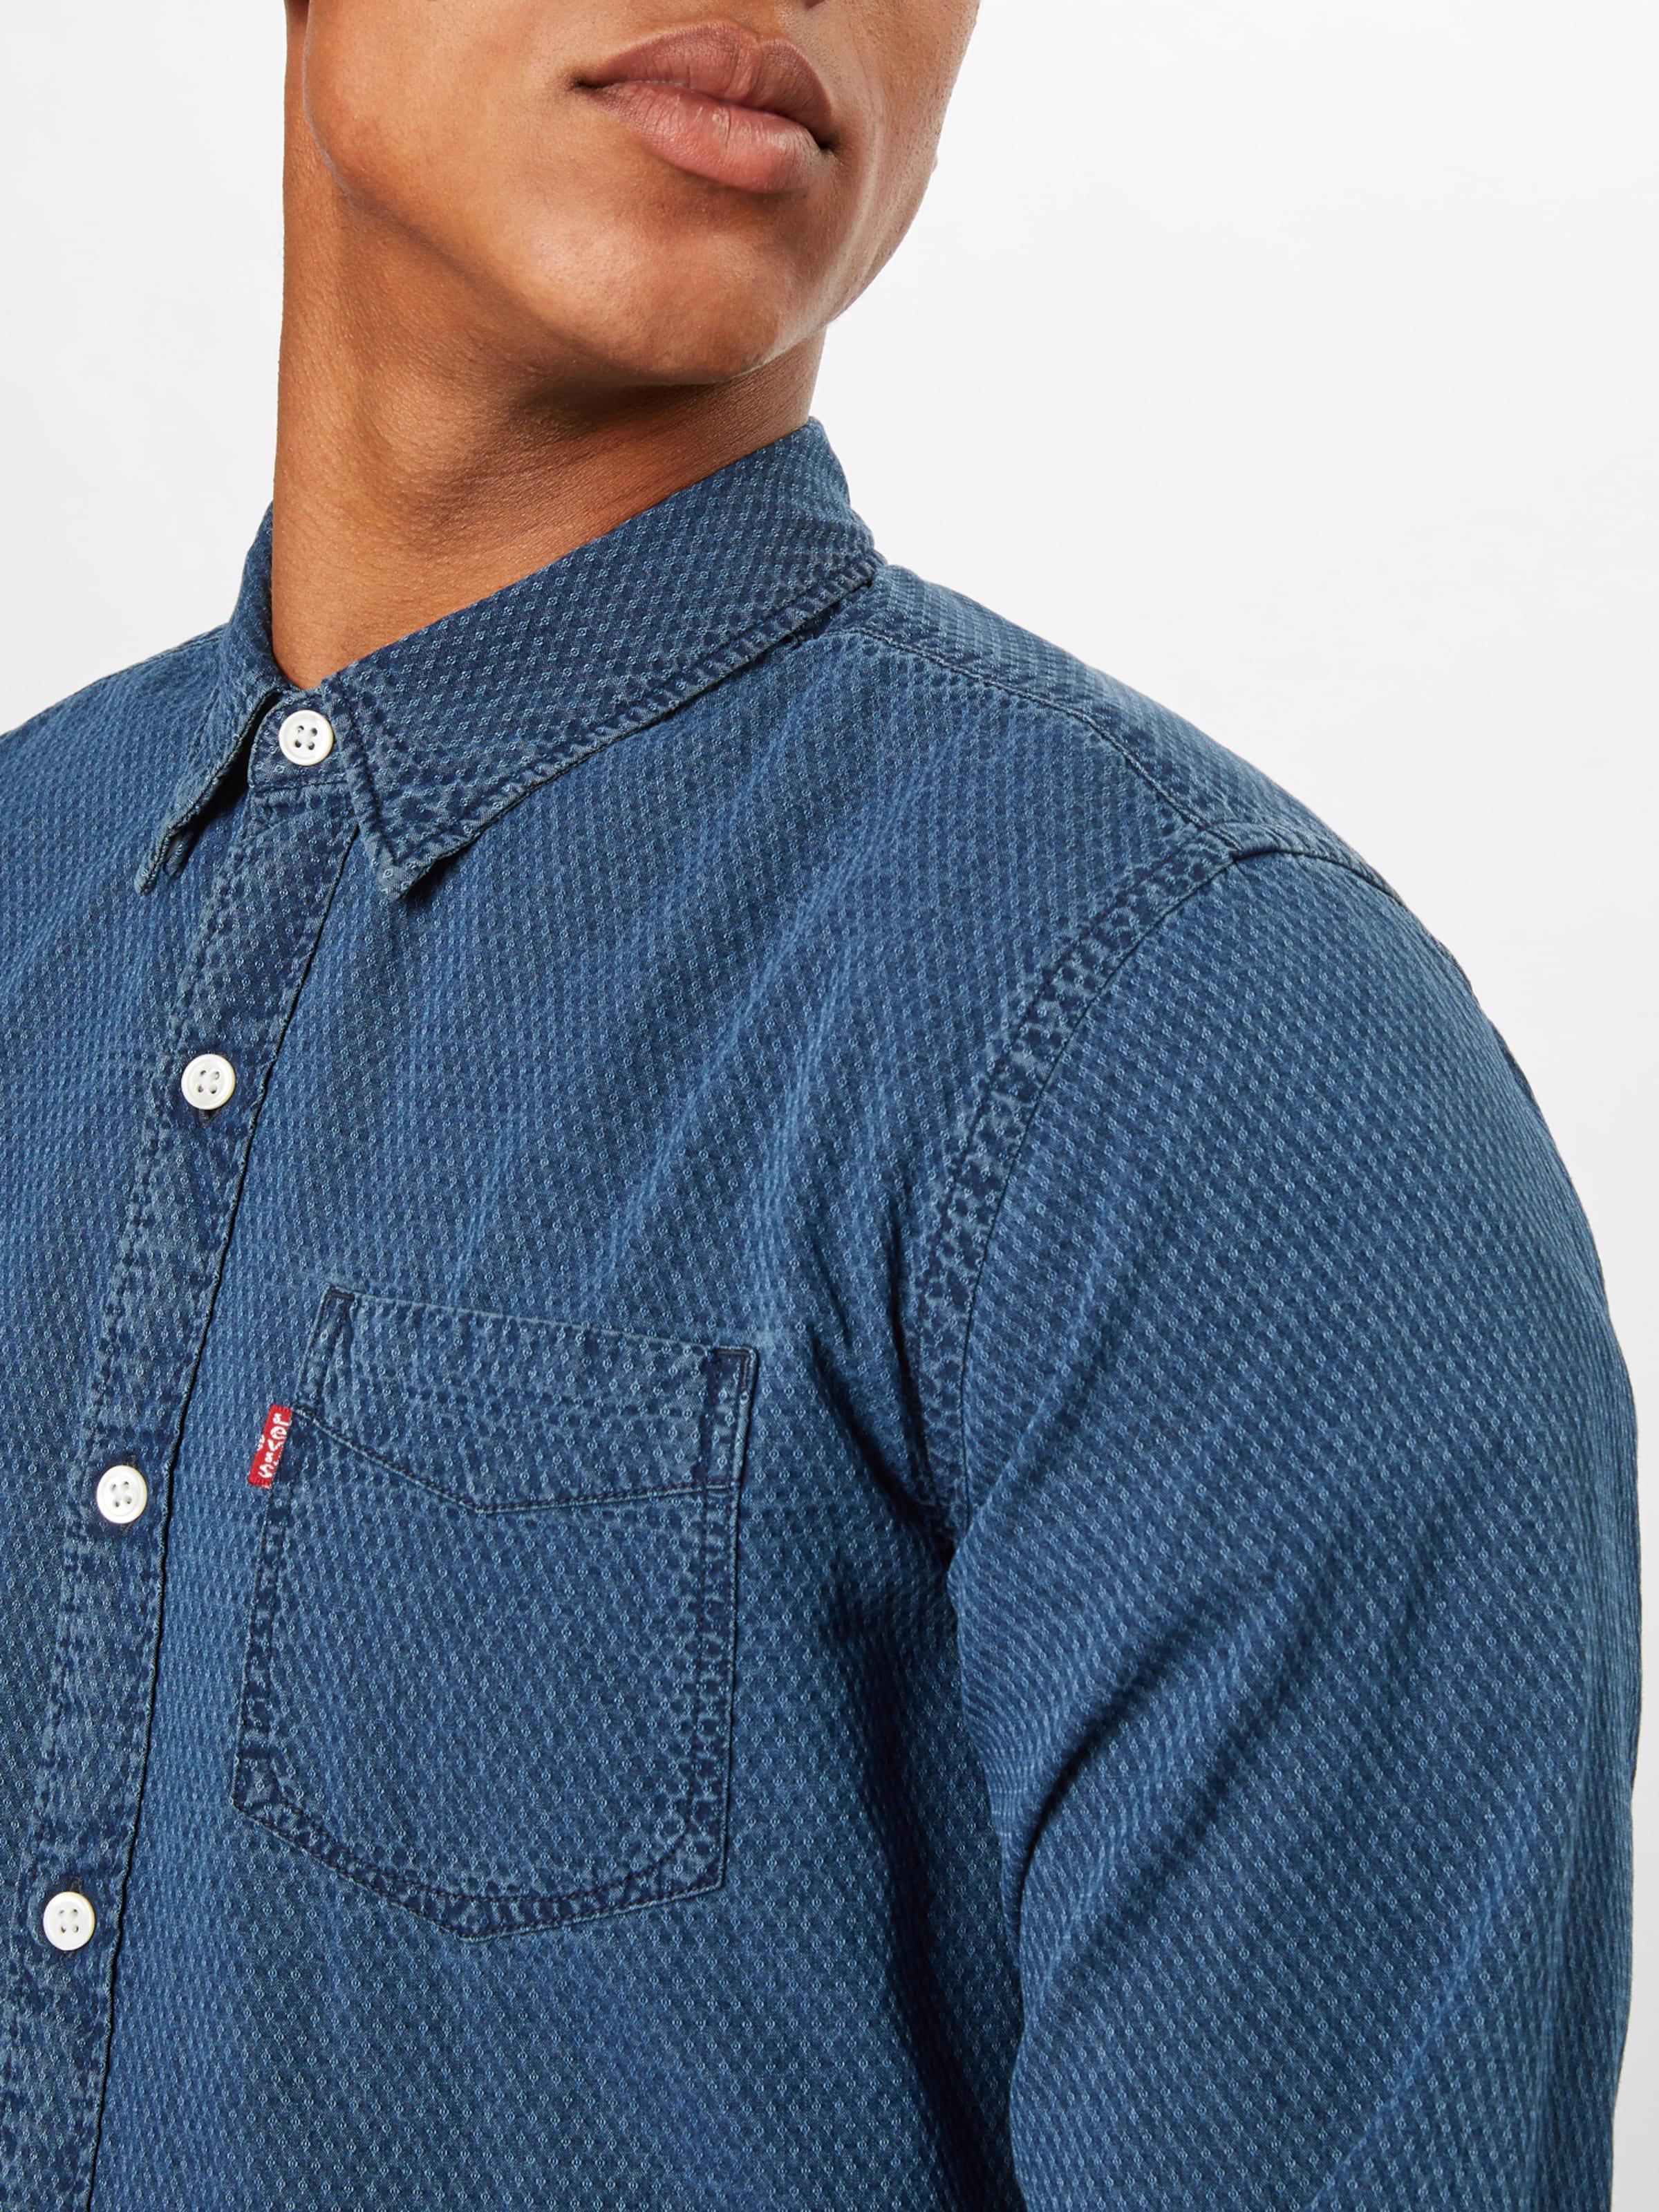 'sunset1pocketshirt' Bleu Chemise Levi's En Denim LSUVpqMGz